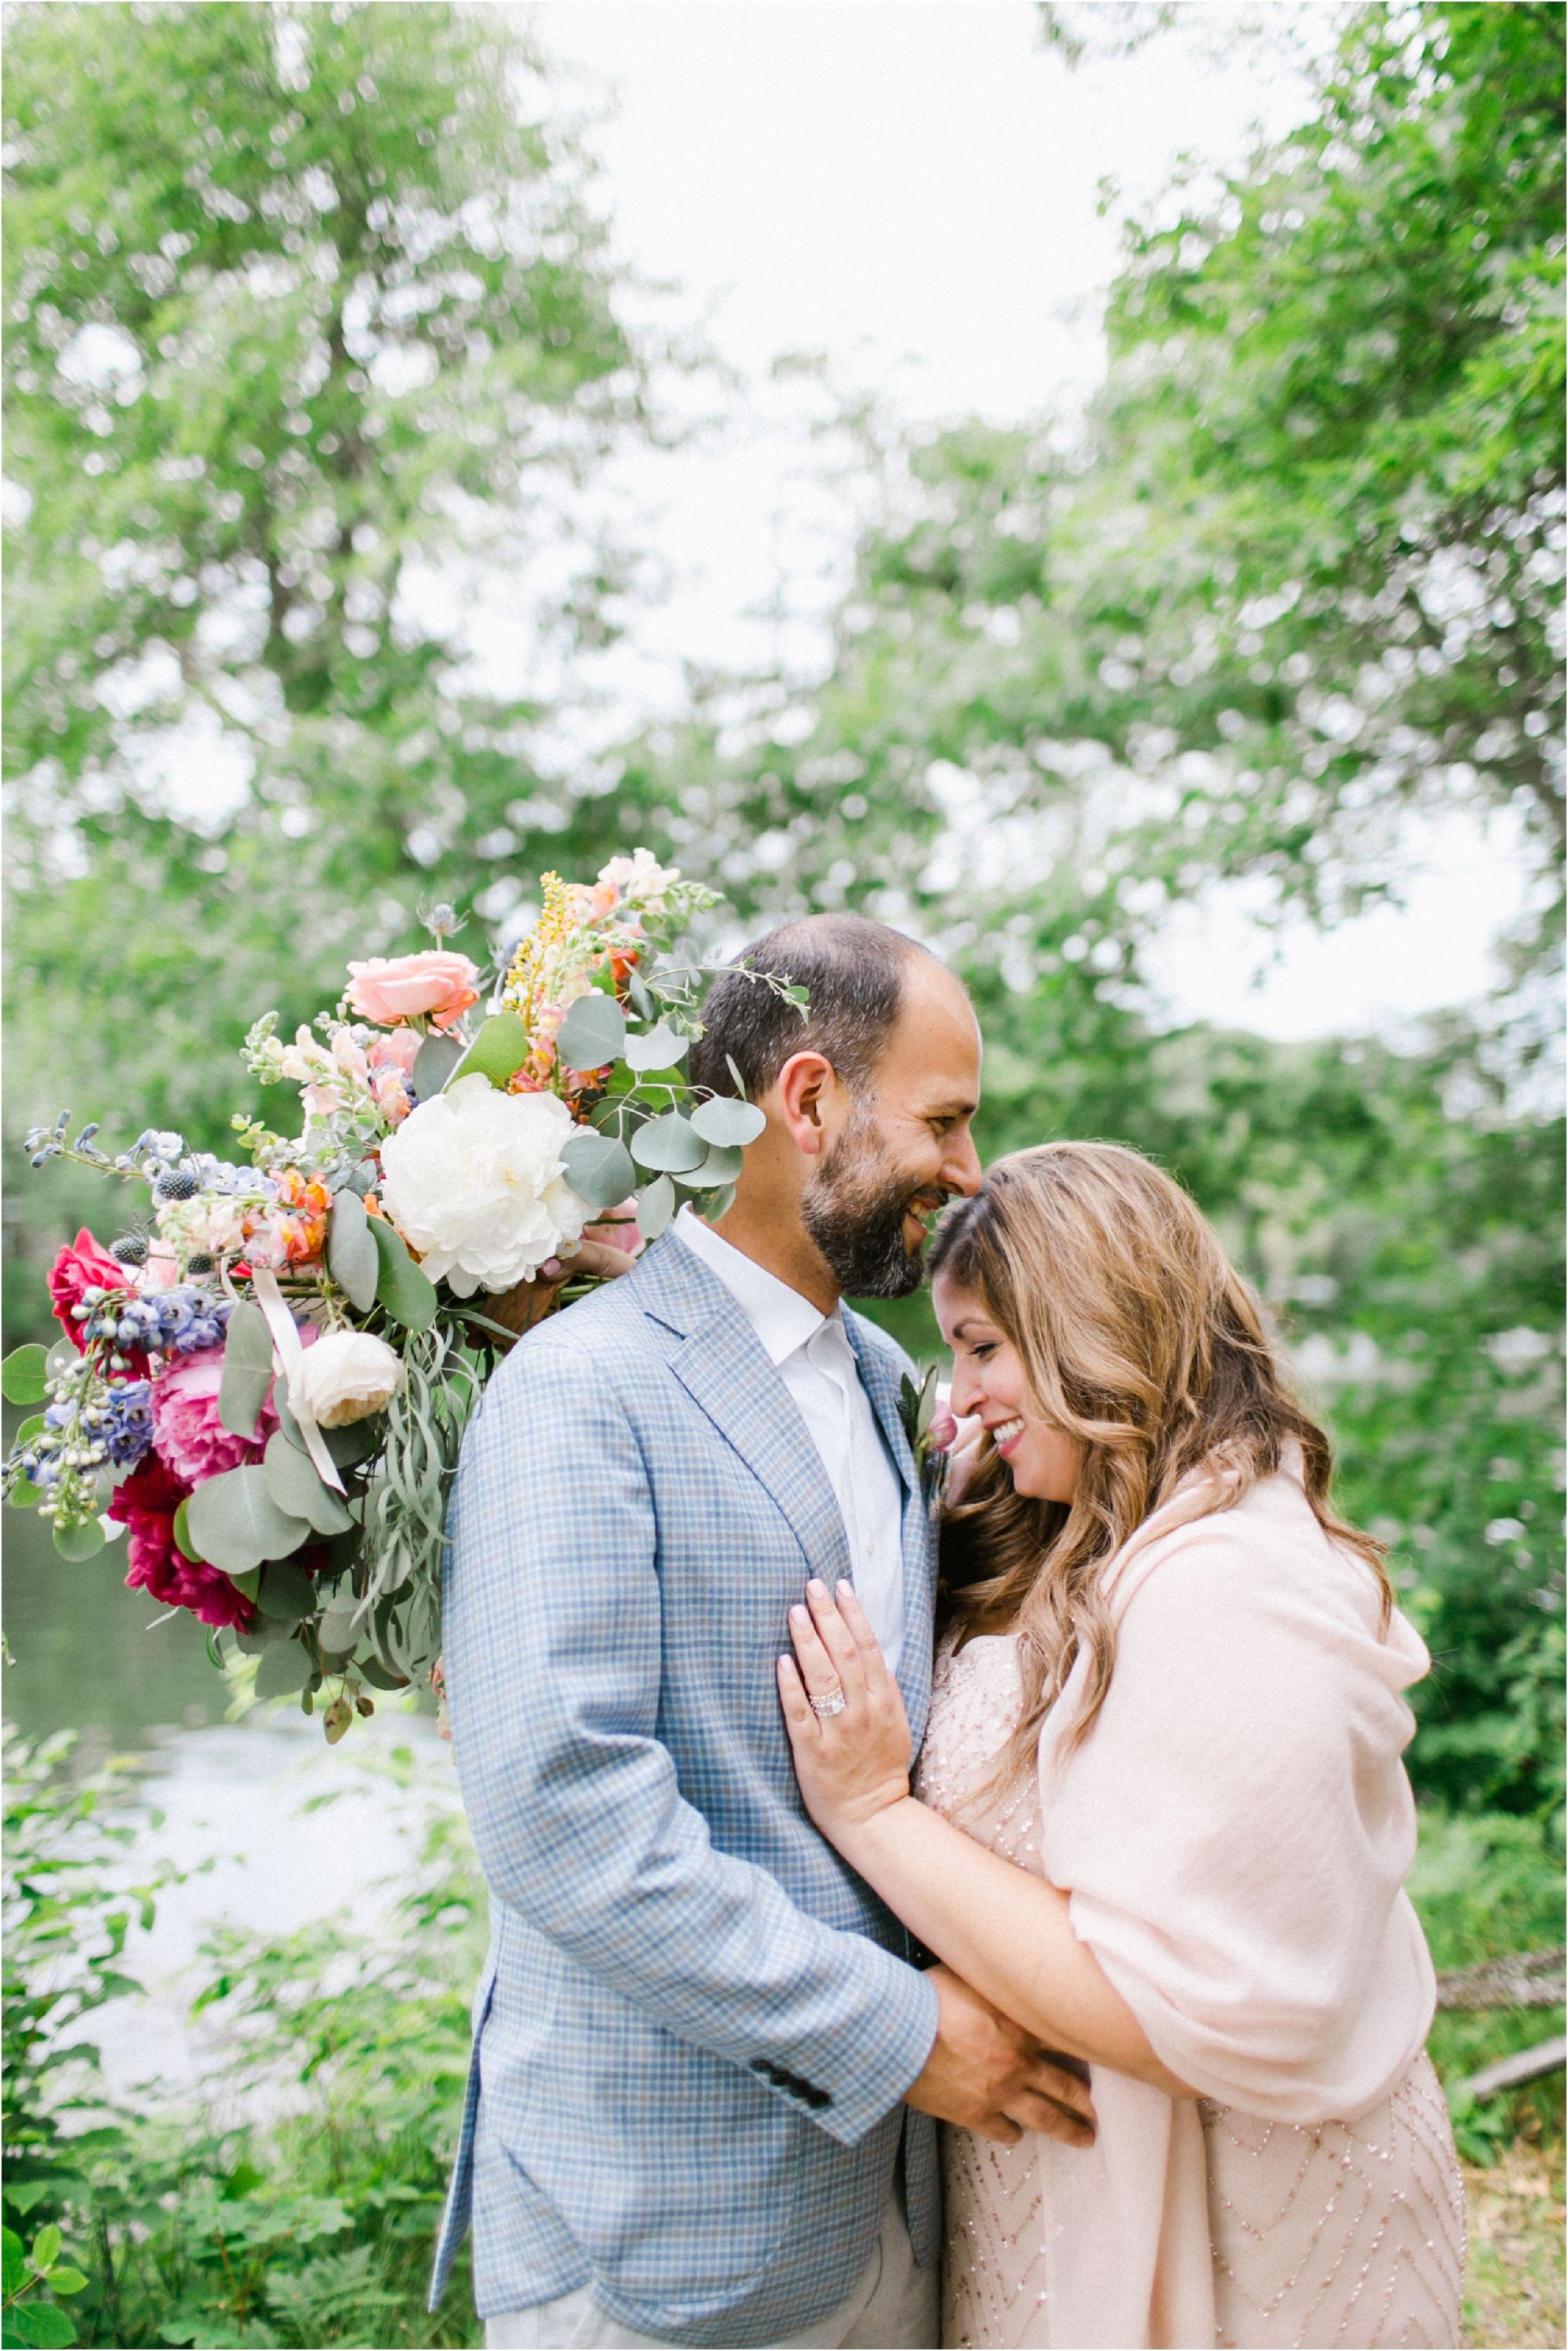 Wedding Photography Brainerd MN Aimee Jobe Photography Private Lake Residence Bloom Designs_0053.jpg